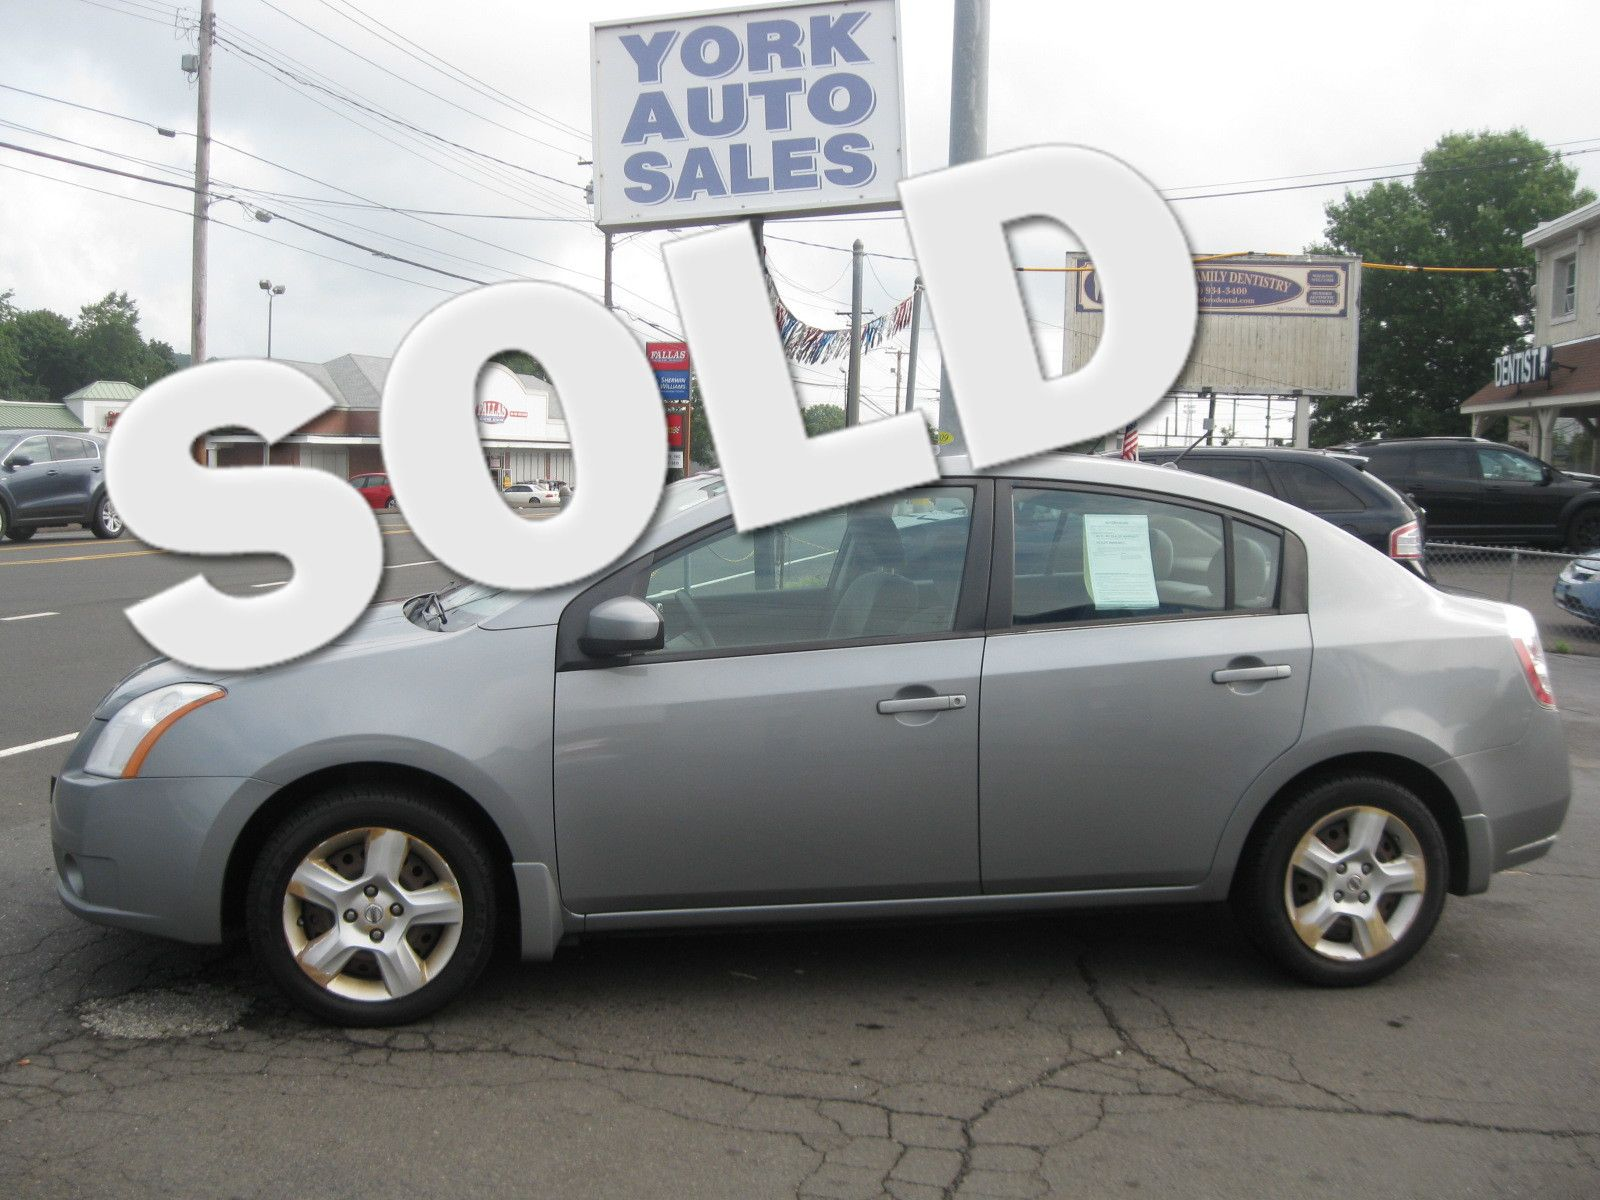 2008 Nissan Sentra 20 S city CT York Auto Sales in , ...